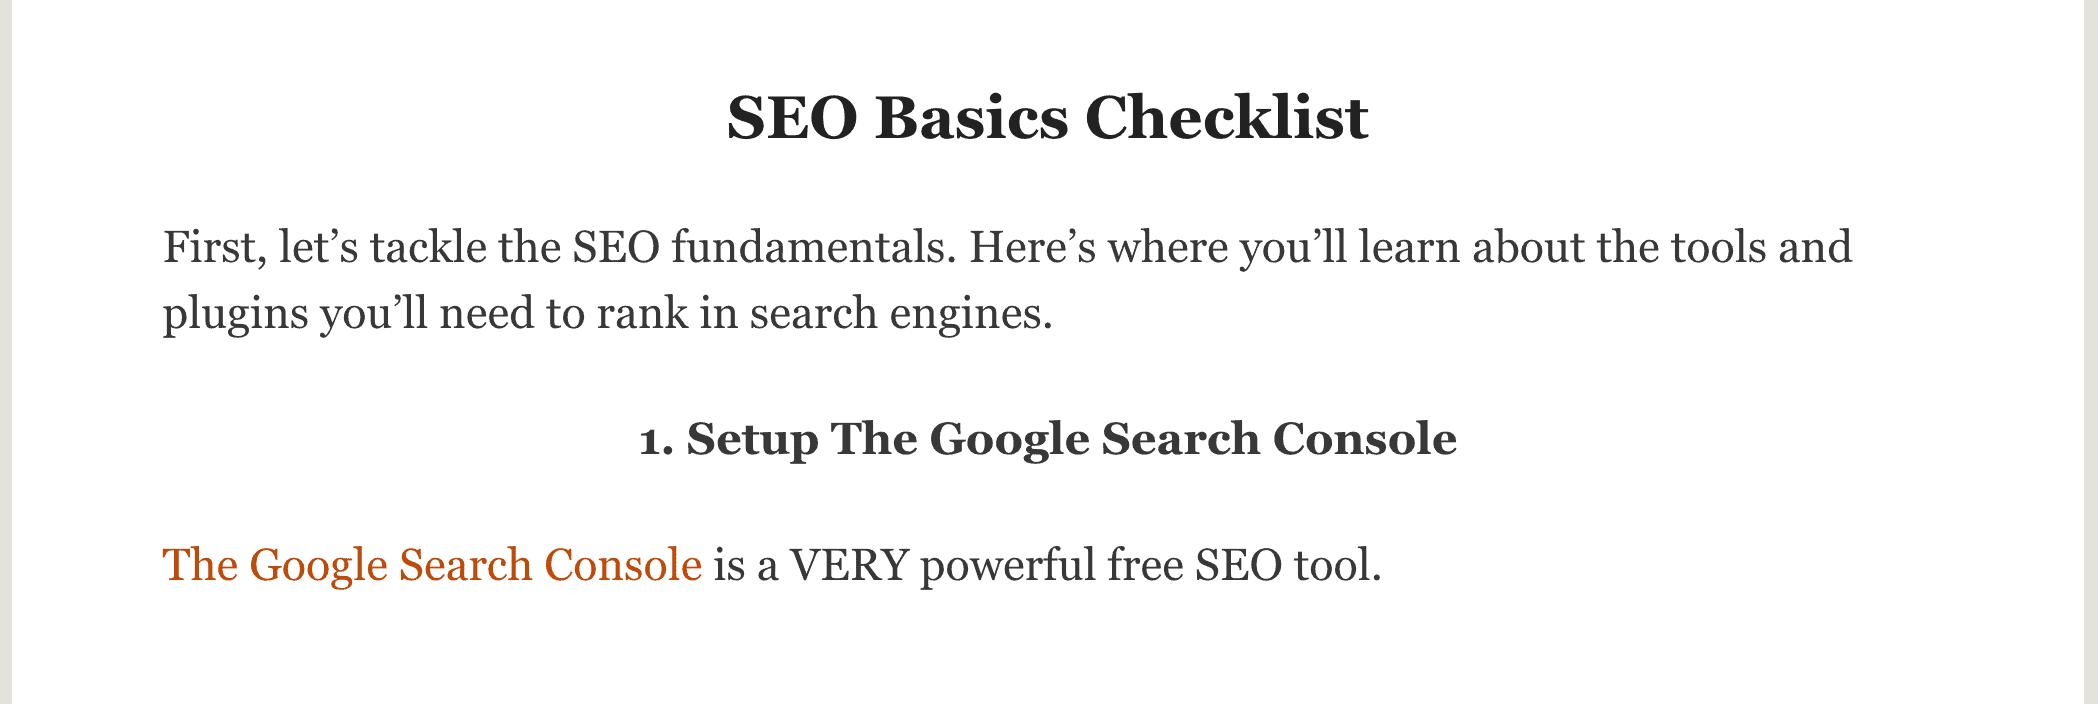 SEO Checklist – New first step